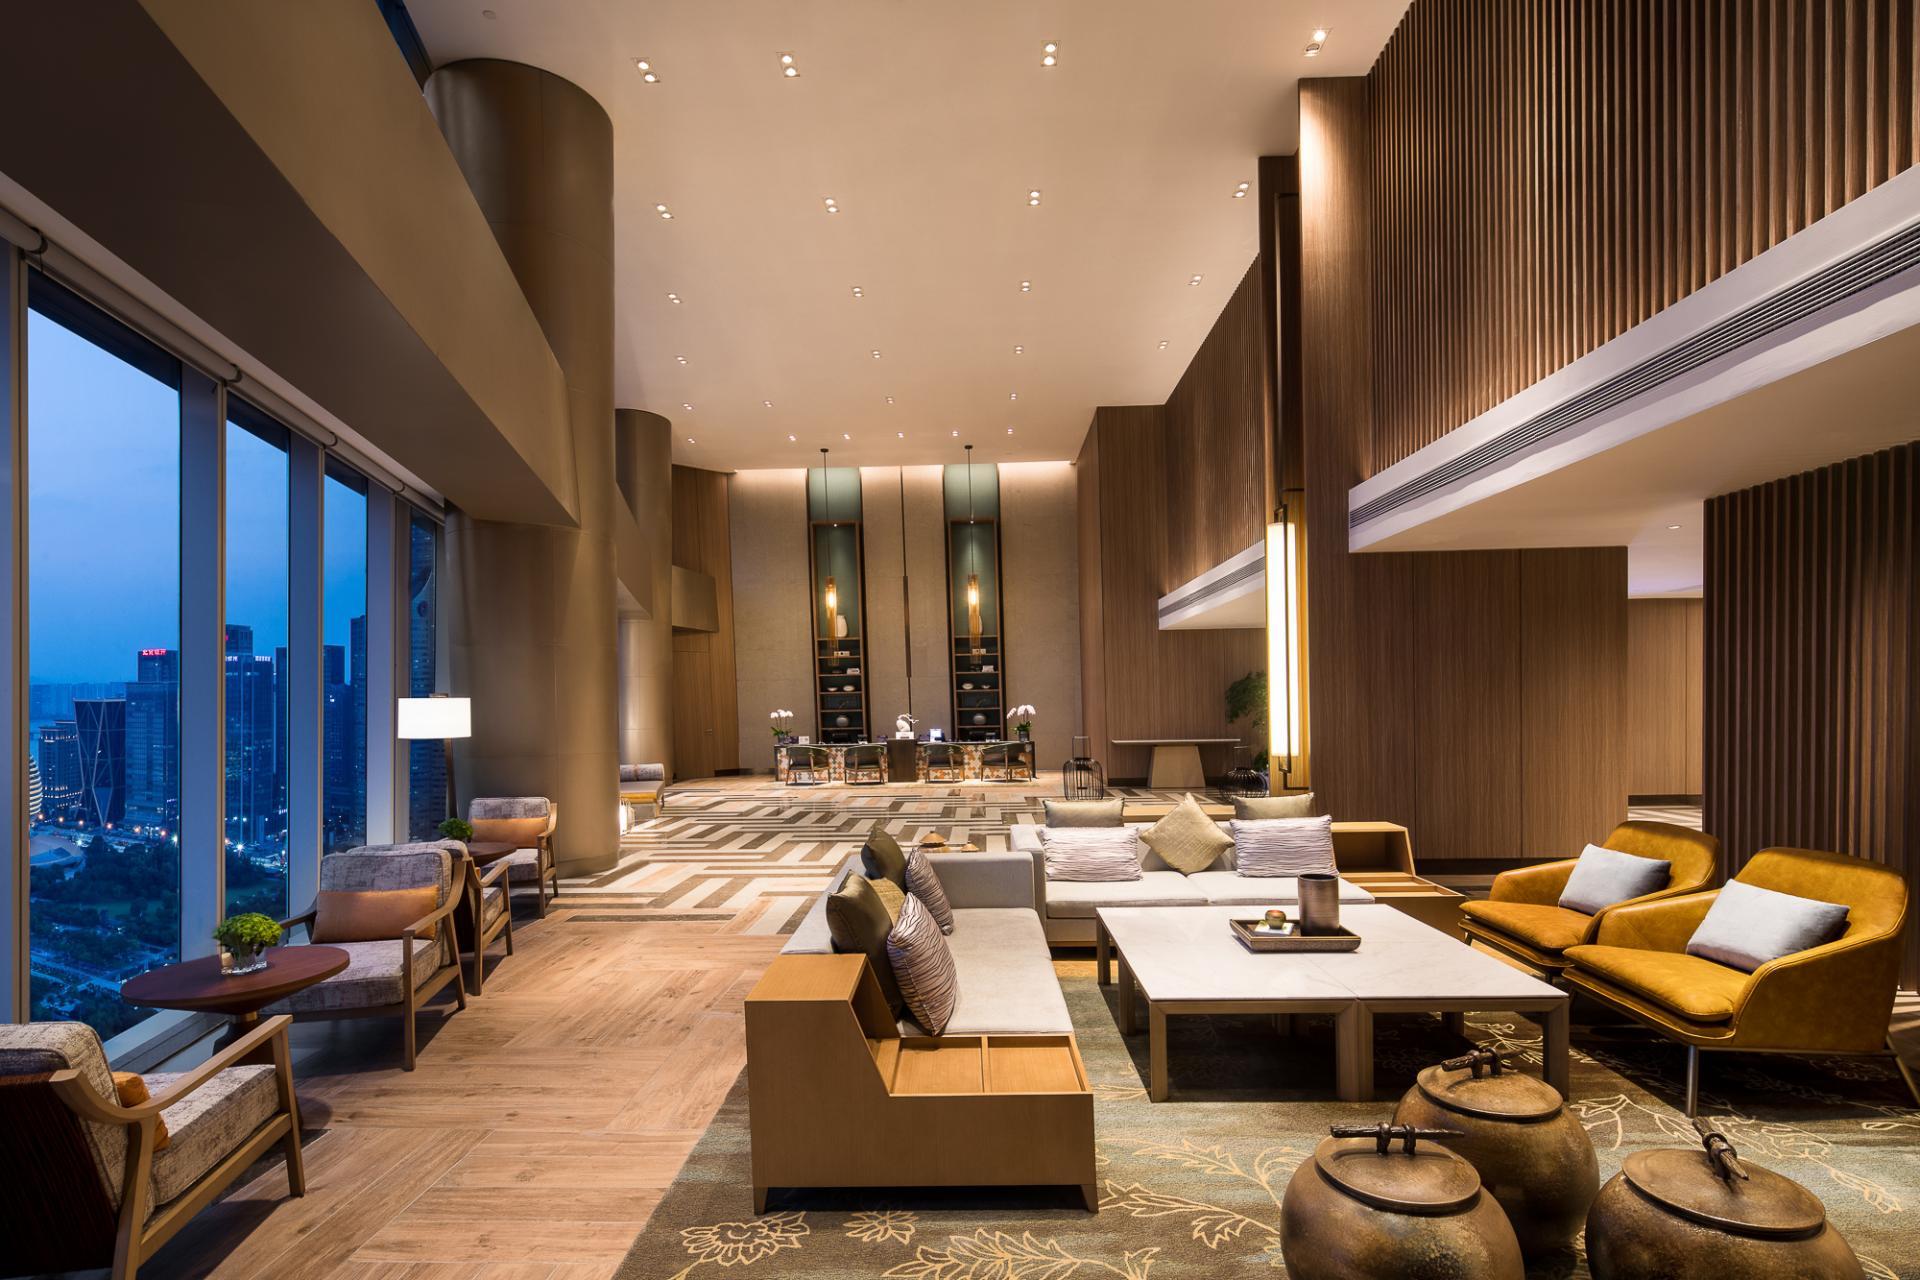 Lobby at Ascott Raffles City Hangzhou Apartment